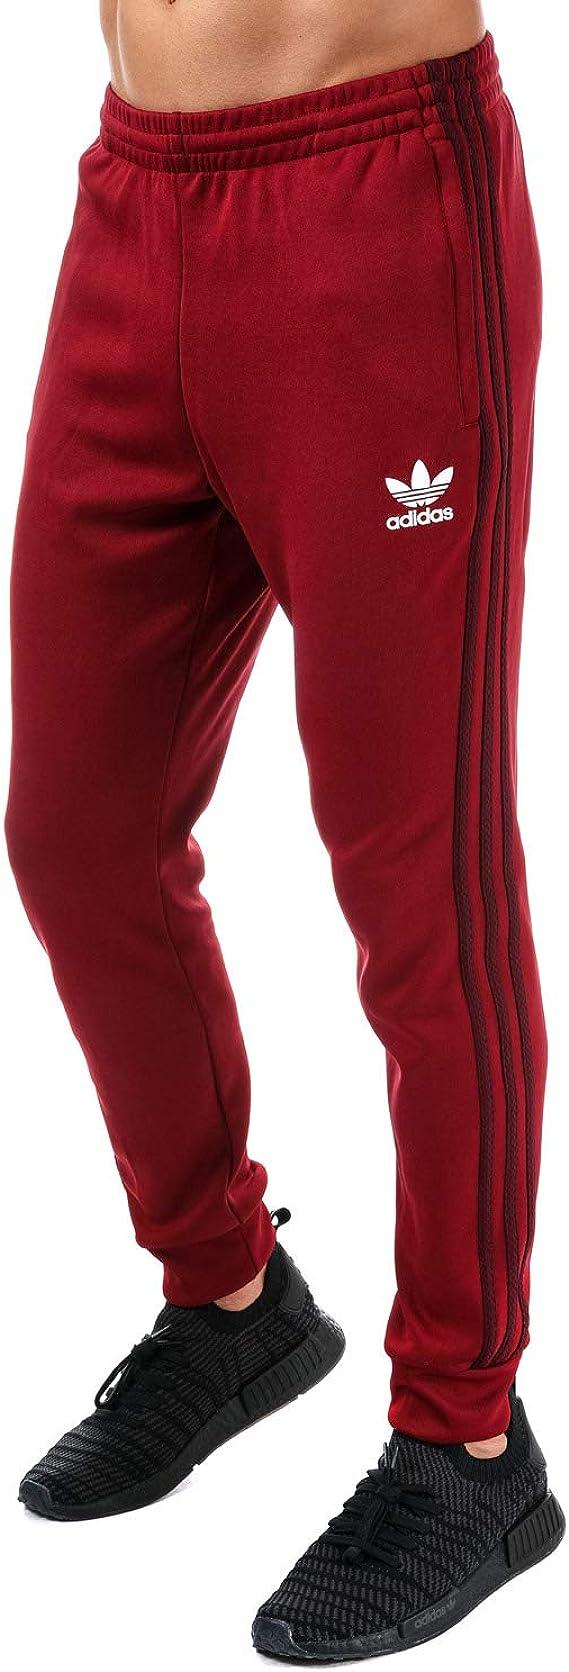 pantaloni tuta adidas rossi uomo